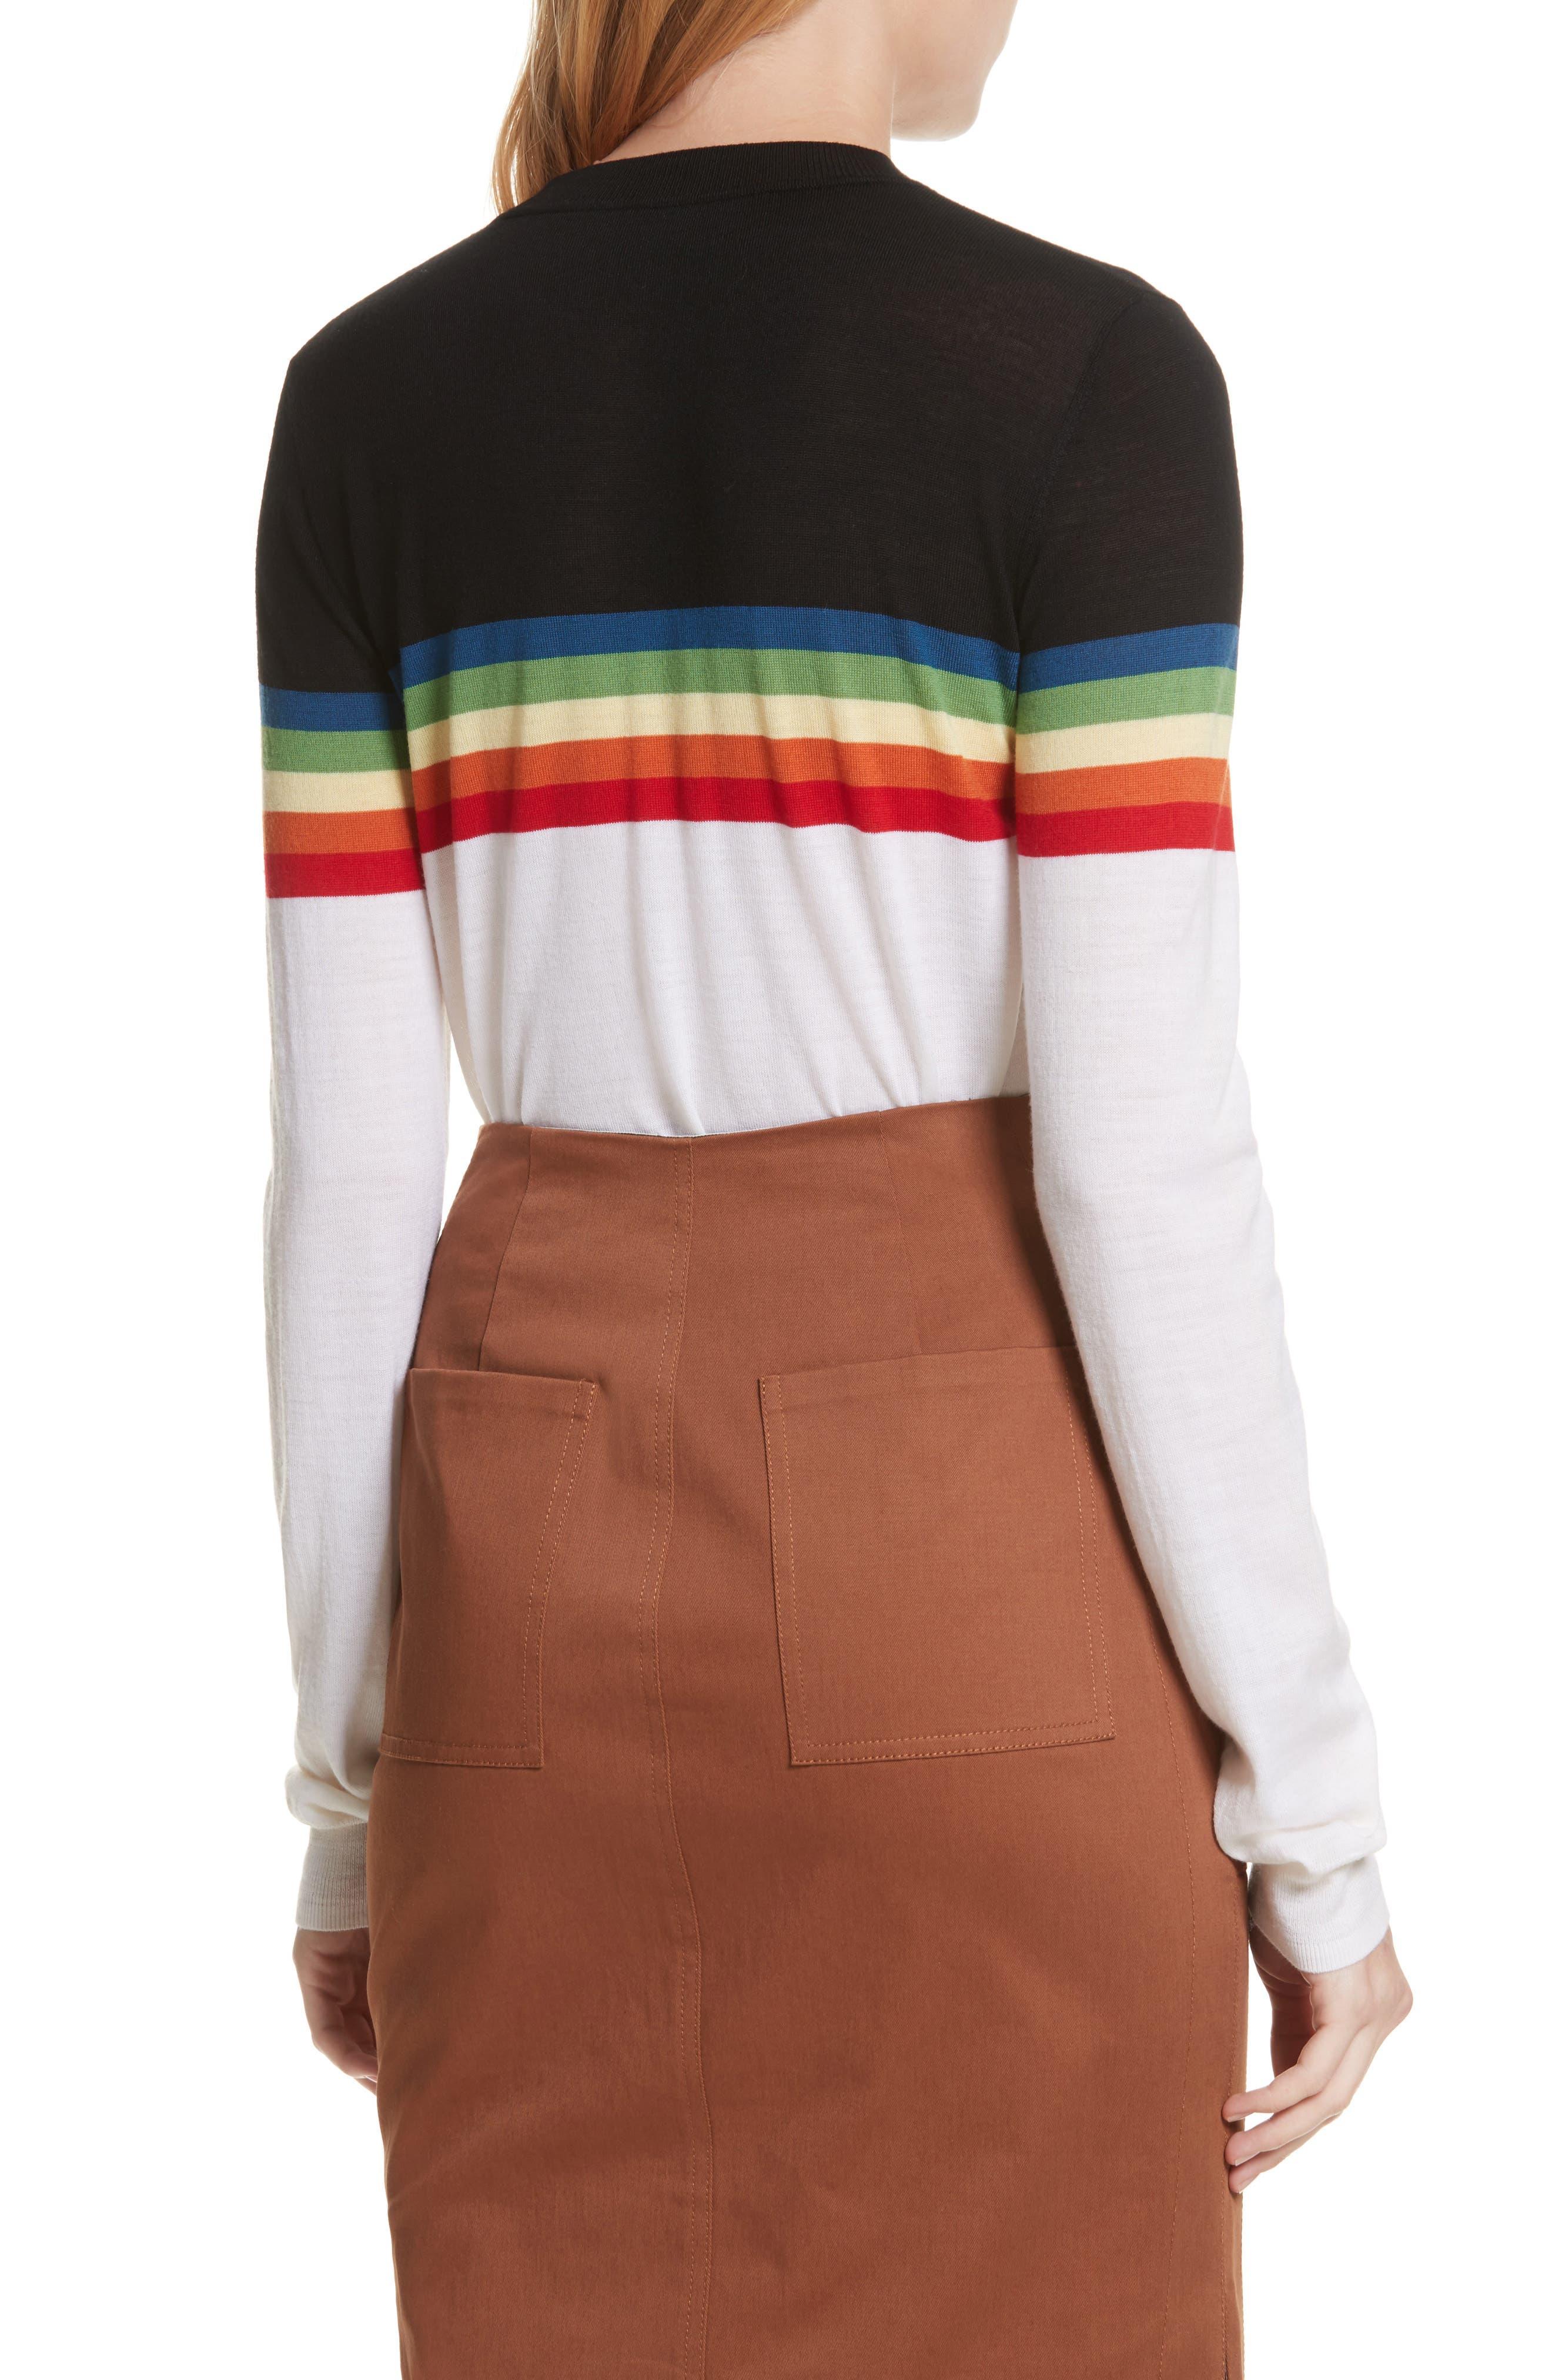 Diane von Furstenberg Rainbow Sweater,                             Alternate thumbnail 2, color,                             107